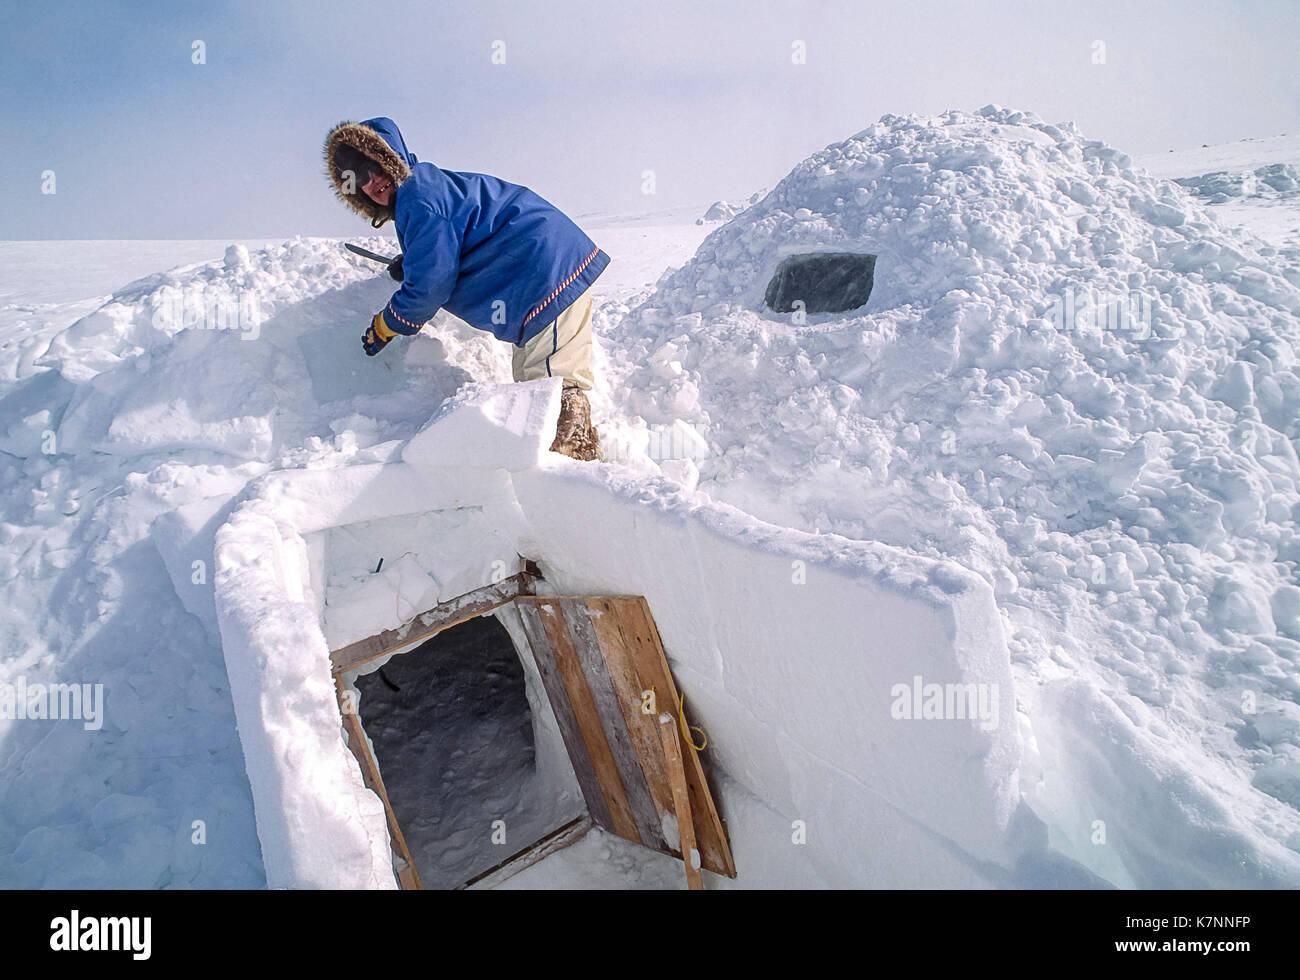 Eskimo Building An Igloo Stock Photos & Eskimo Building An